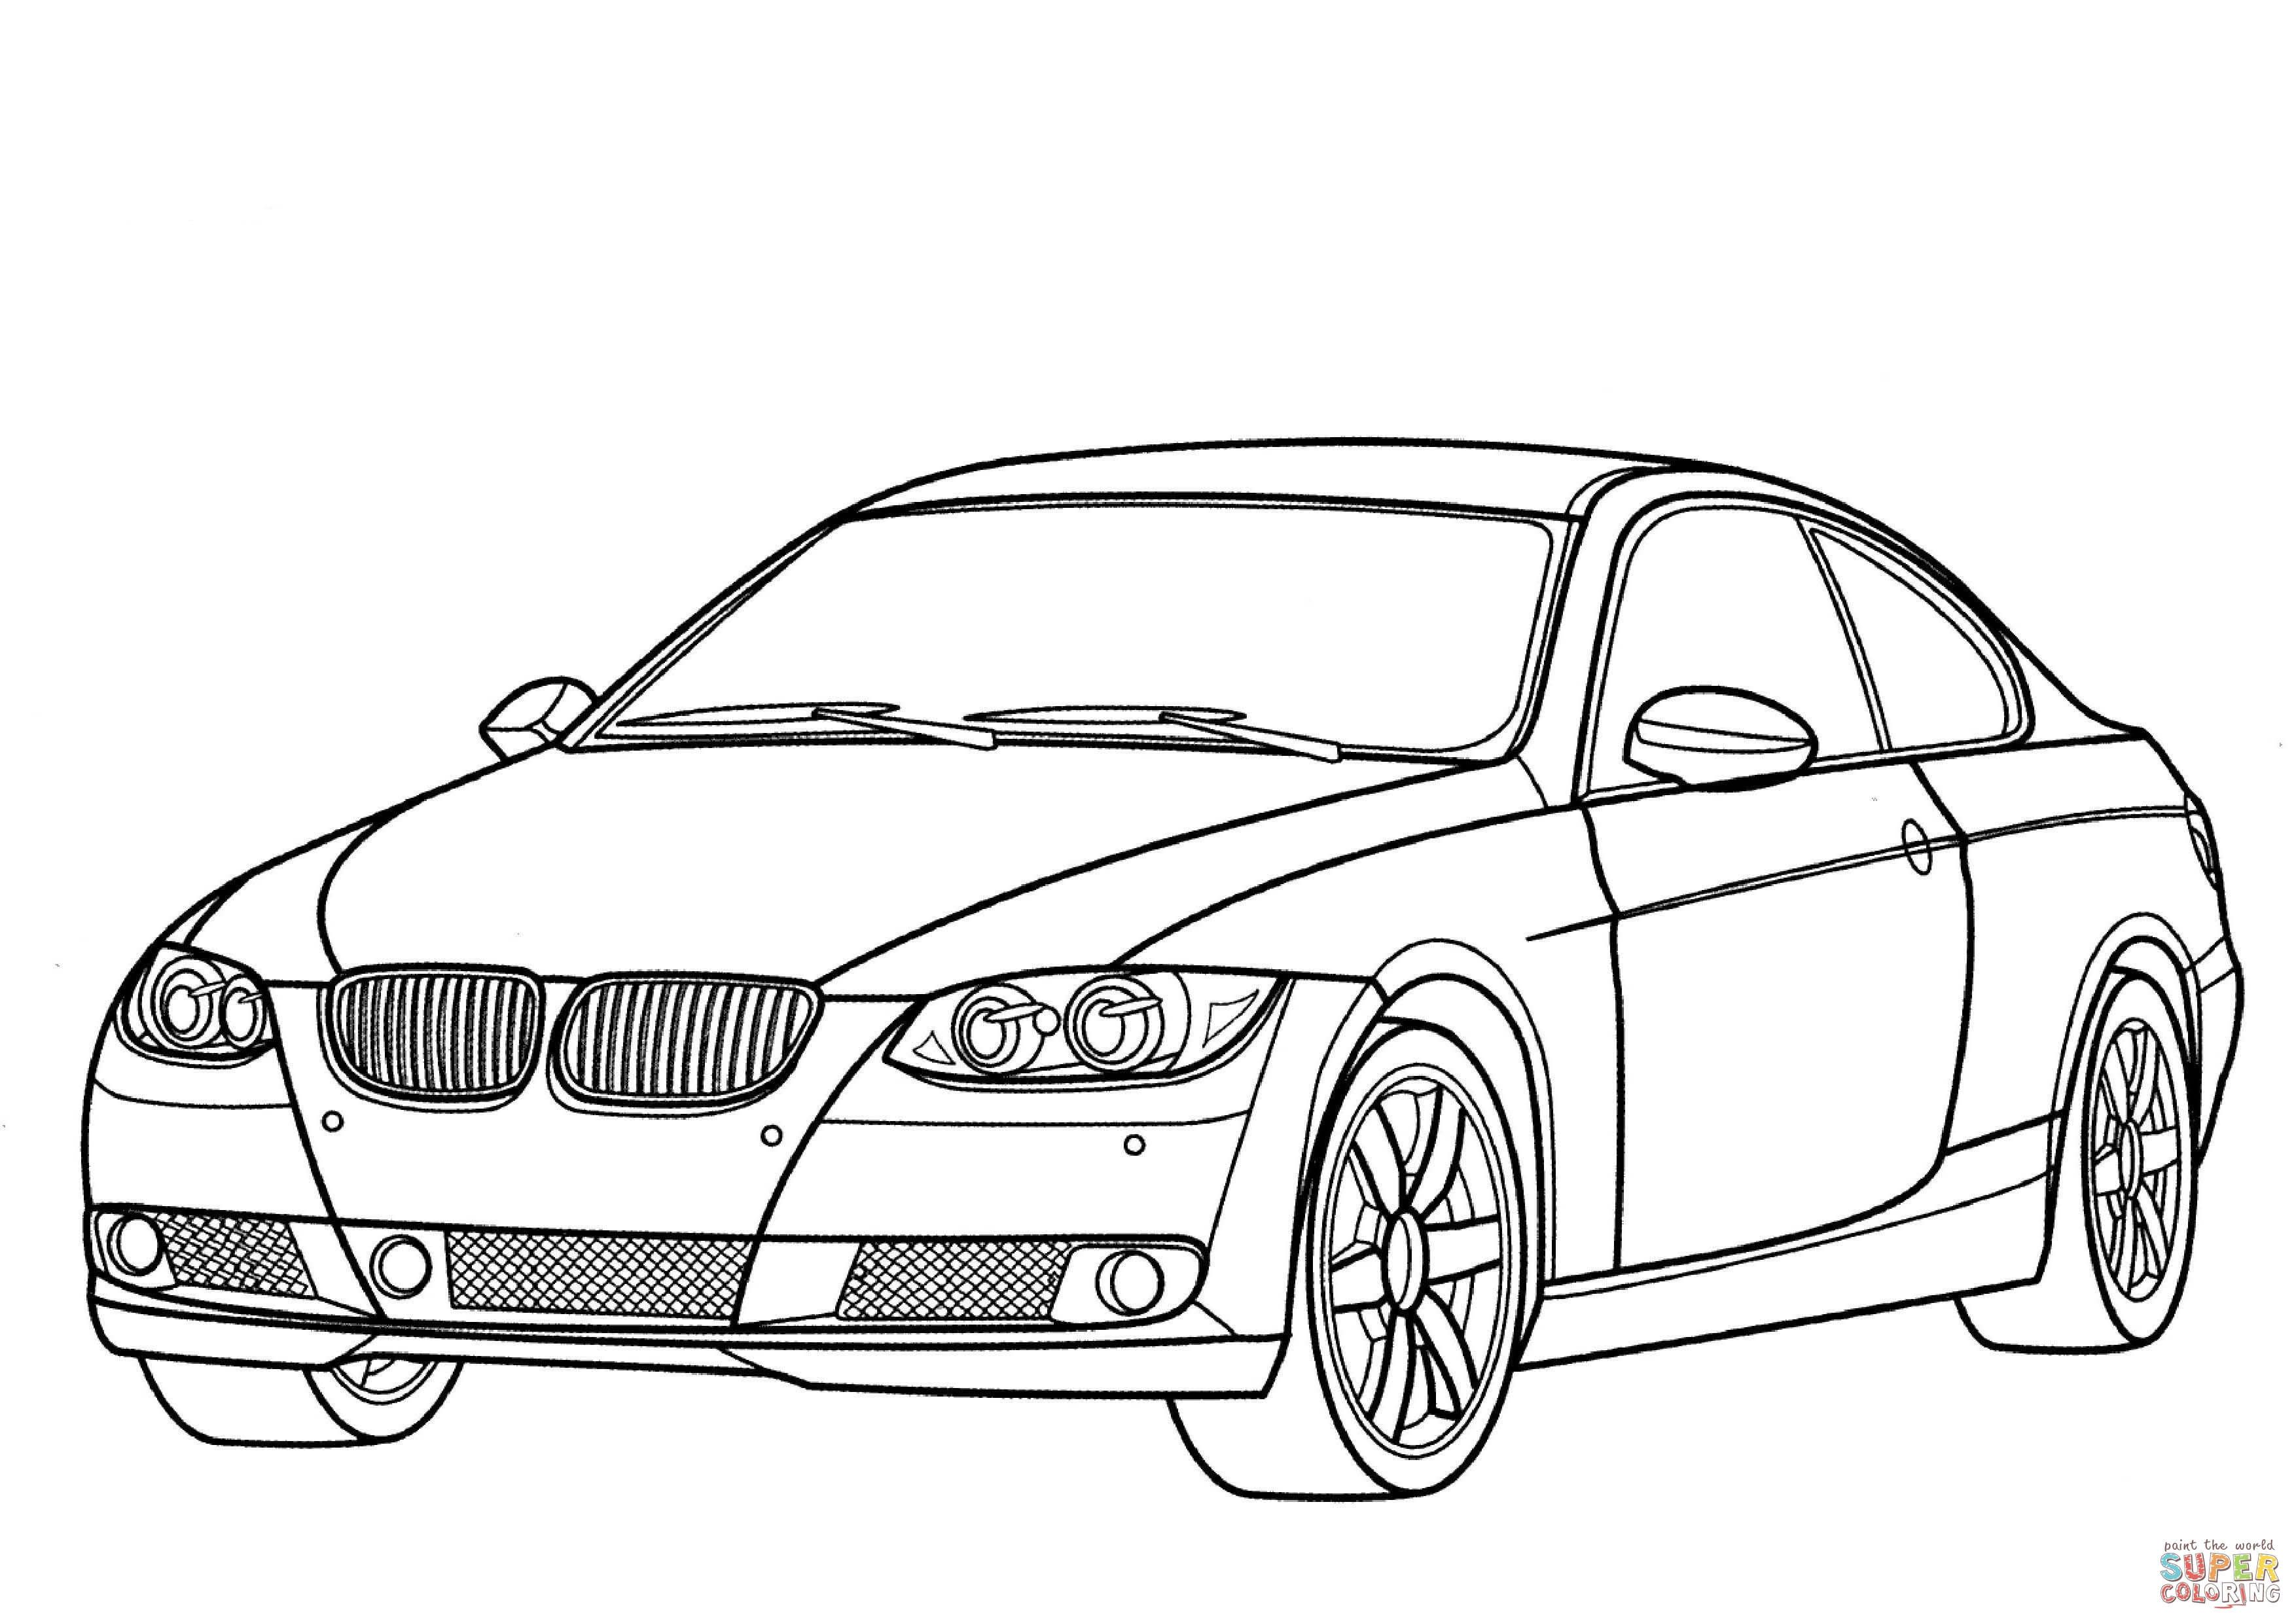 Ausmalbilder Autos Bmw 3 Serie Cars Coloring Pages Race Car Coloring Pages Car Colors